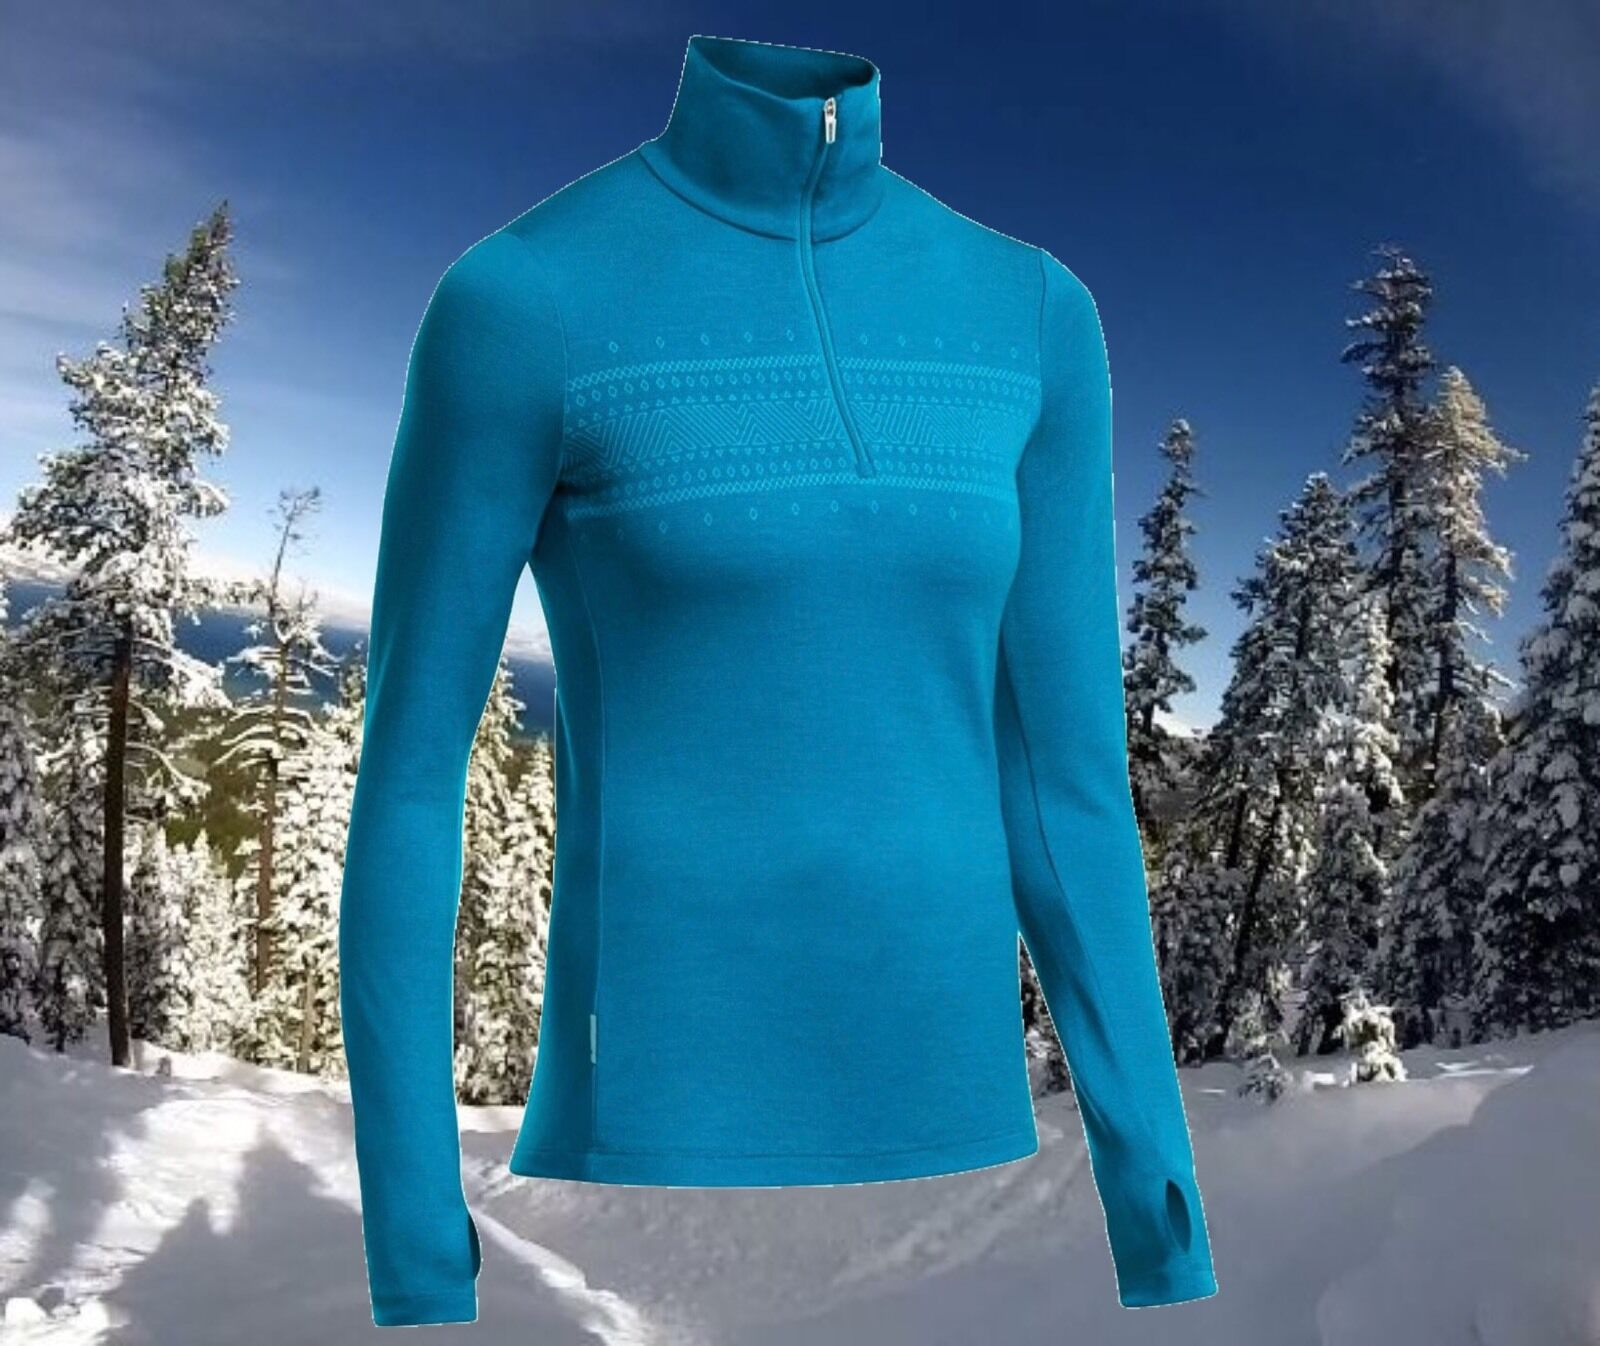 Icebreaker Womens XS Thermal Merino Wool 1 2 Zip Tech Sports Ski Top Nwt